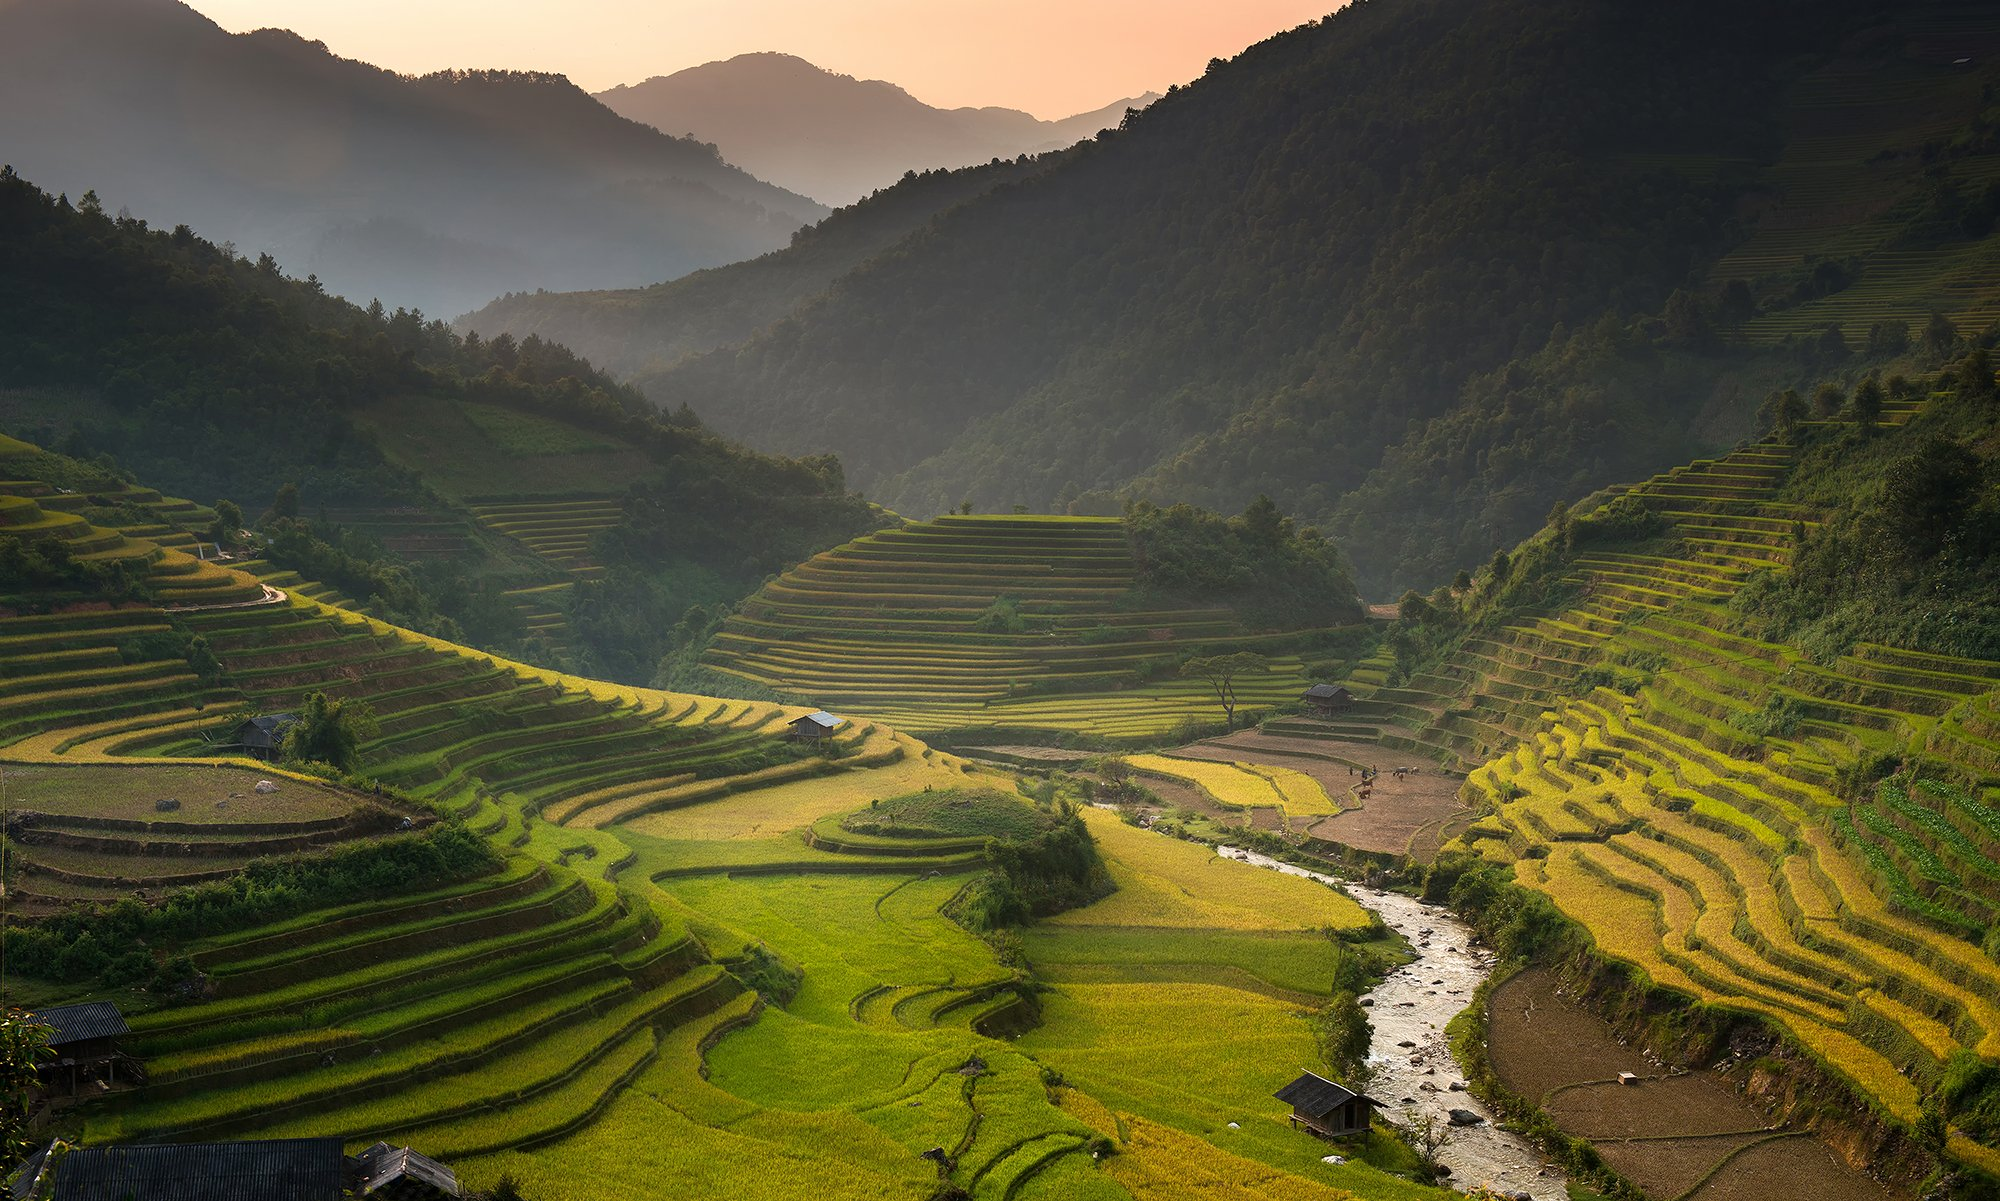 Color Image, Grass, Horizontal, Landscape, Mountain Range, North Vietnam, Outdoors, Photography, Rice - Food Staple, Rice Paddy, Terraced Field, Tranquil Scene, Vietnam, sarawut intarob